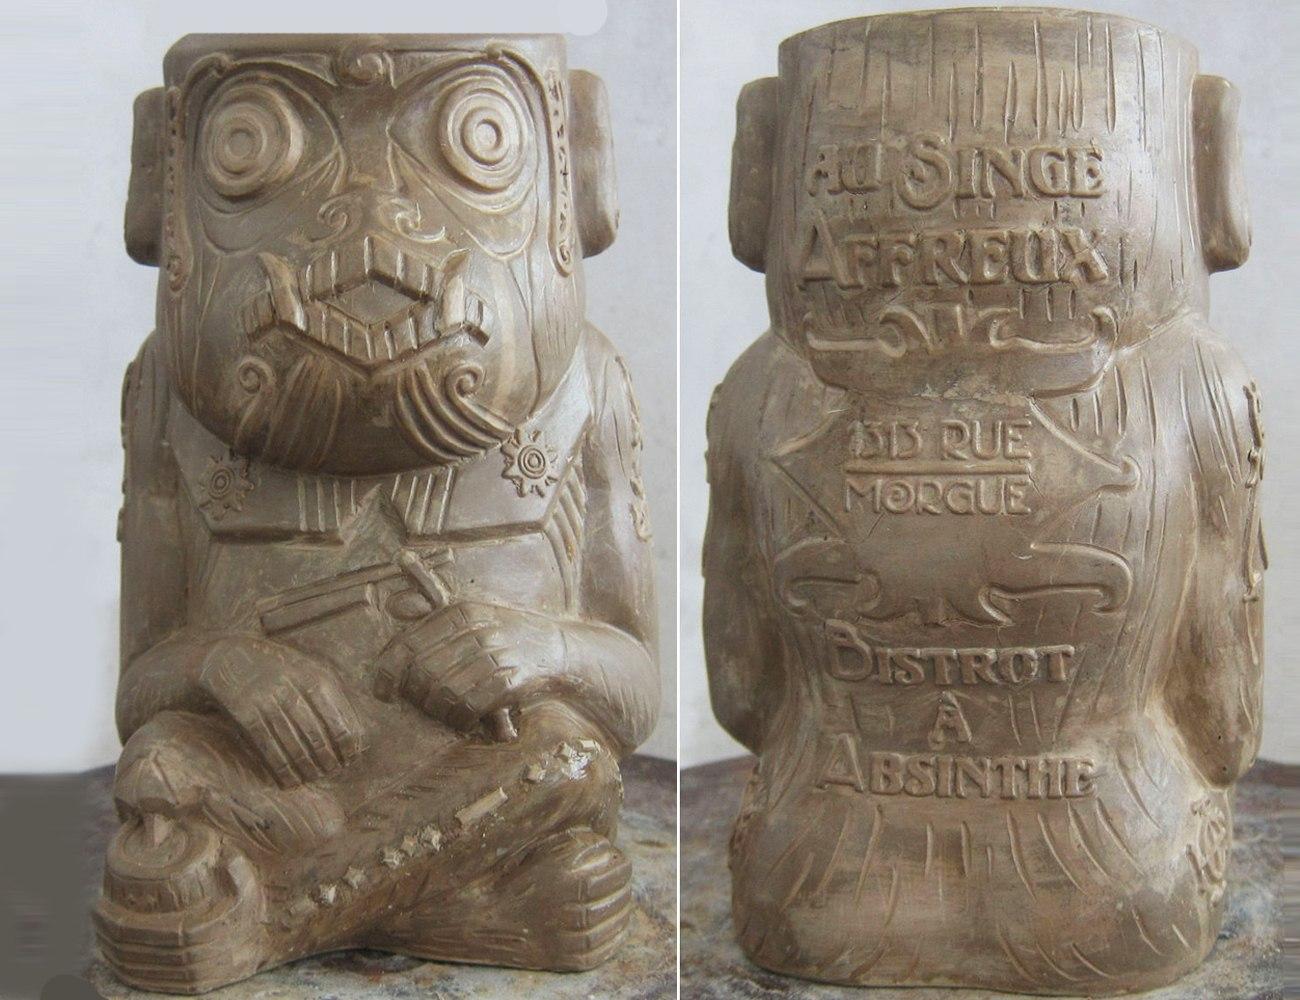 Rue Morgue Murderous Ape Tiki Mug from Horror In Clay